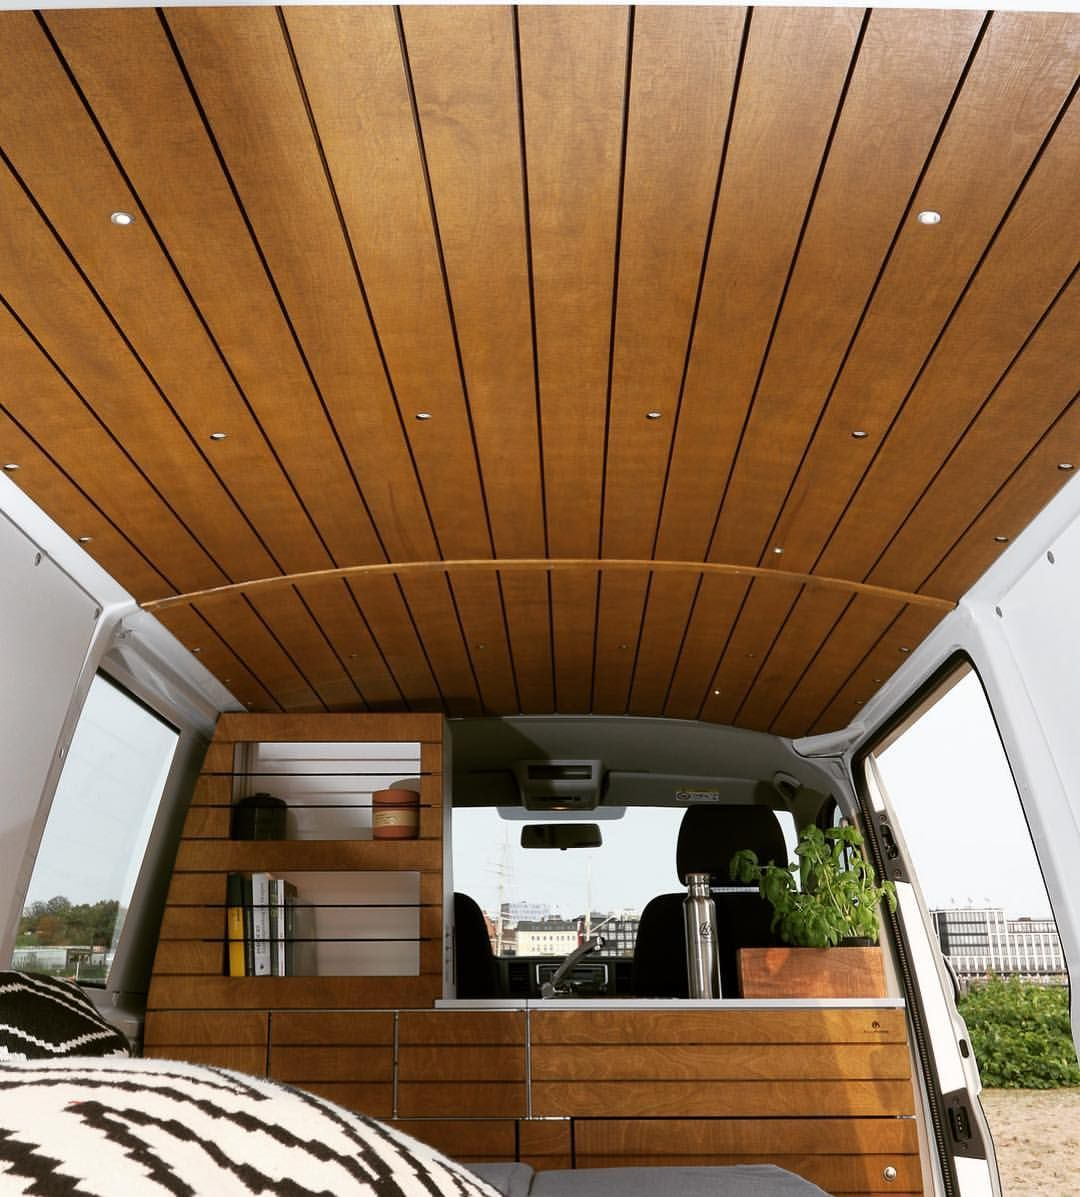 How a wooden ceiling can change the whole atmosphere in a van! #vanlife #vanlove #vaninterior #design #diy #bullifaktur #wood #cnc #van #camper #campervan #rollinghome #homeonwheels #tinyhouseonwheels #campercollective #inspiration #volkswagen